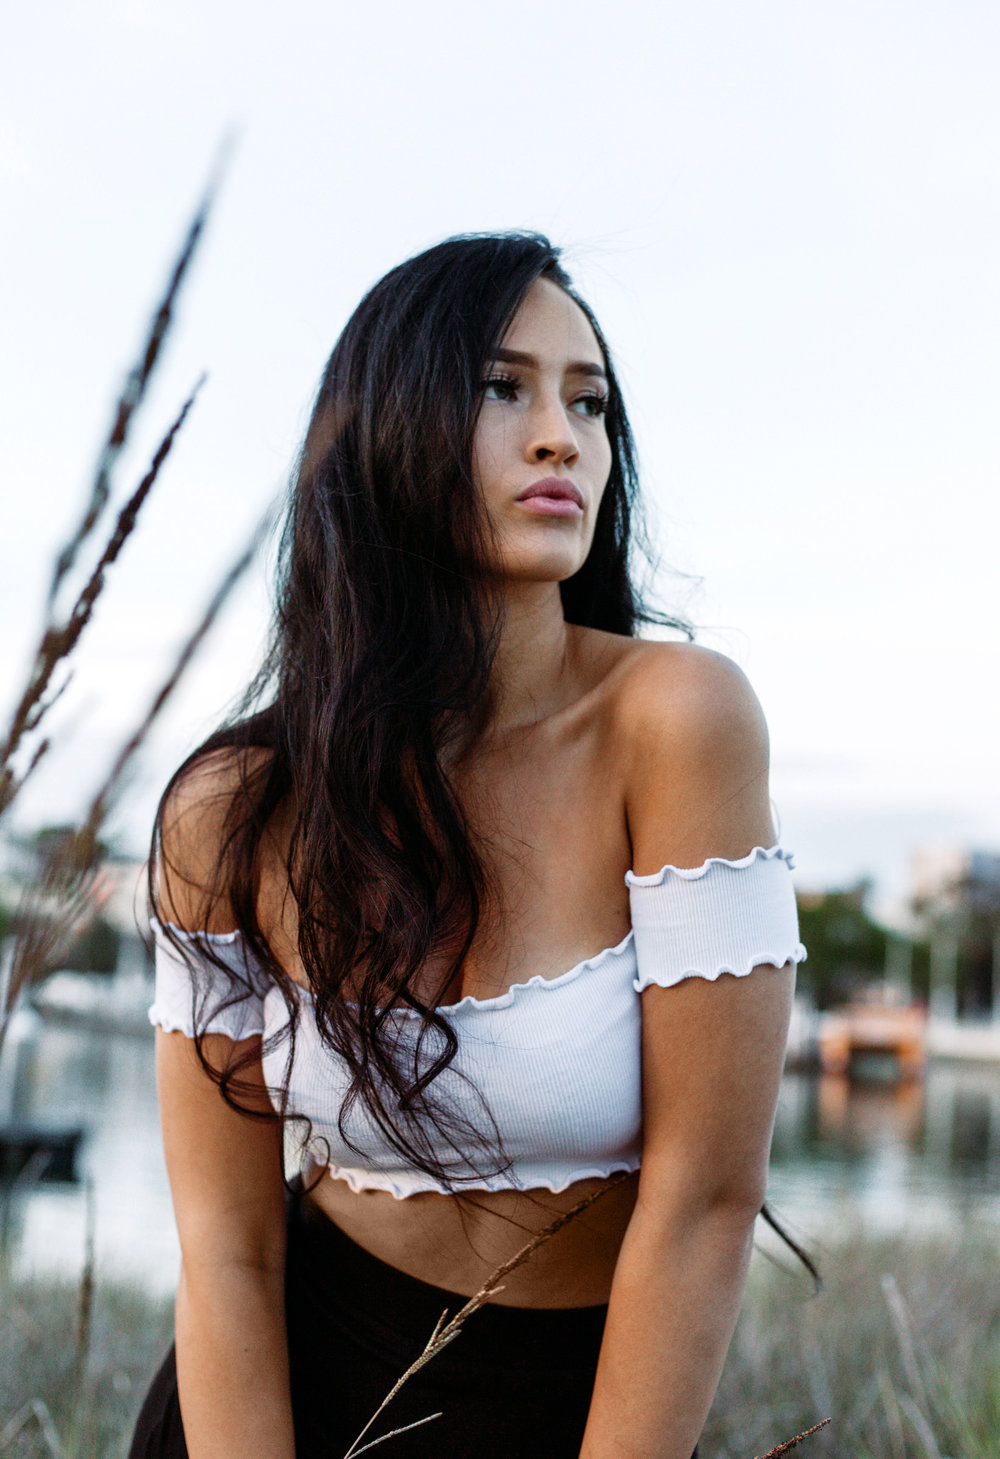 Amelia-HaleyMcLainPhotography-9.JPG